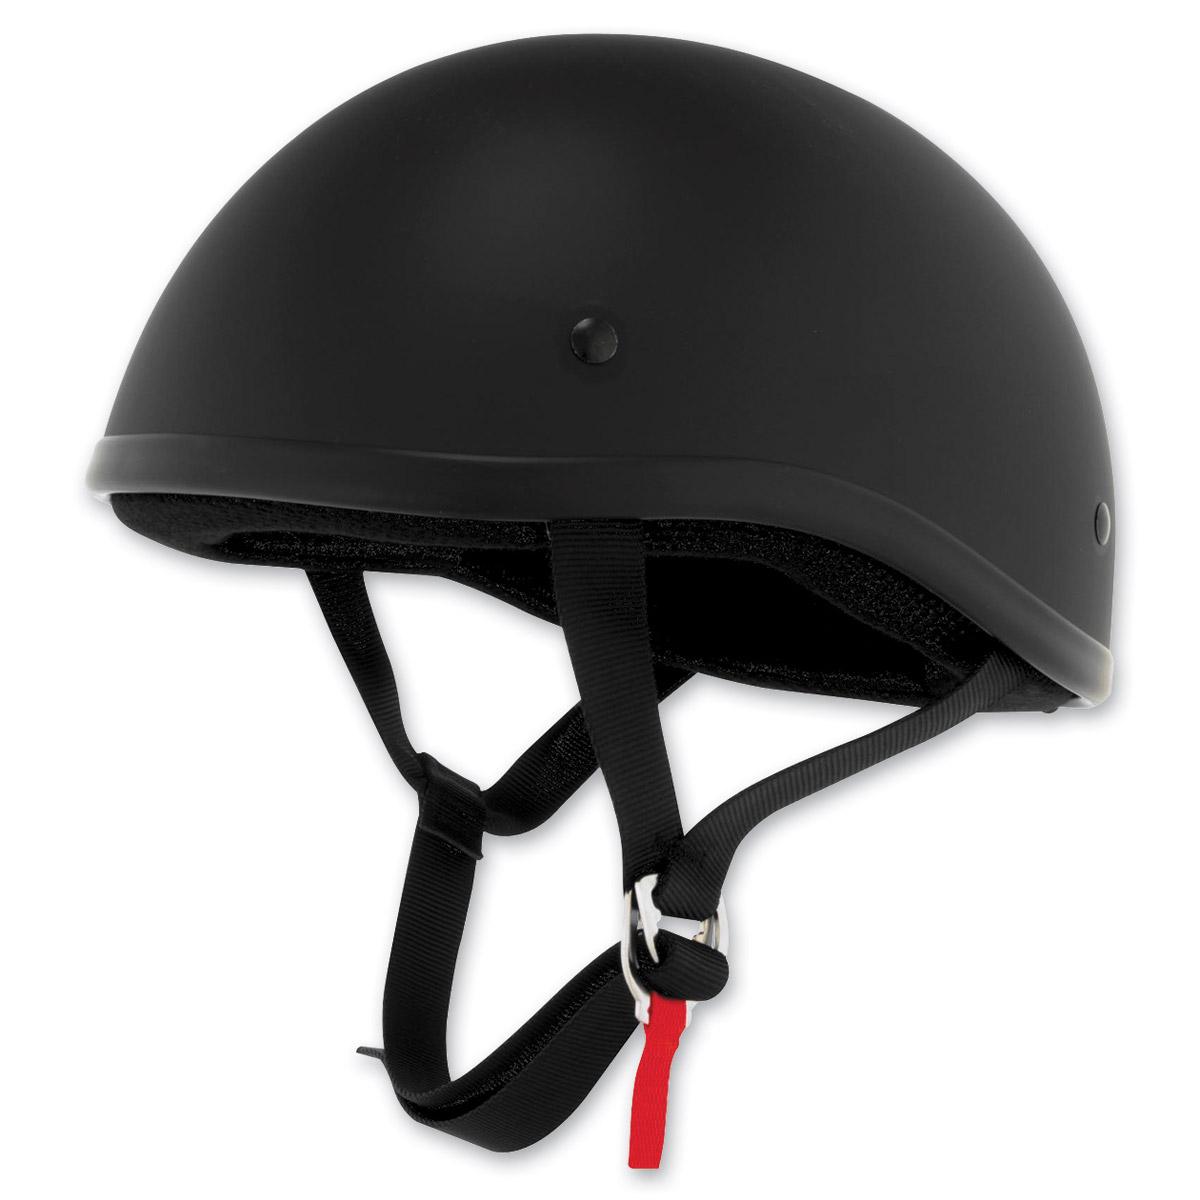 e74632ff Related Categories. Related Categories. Gear · Helmets · Half Helmets